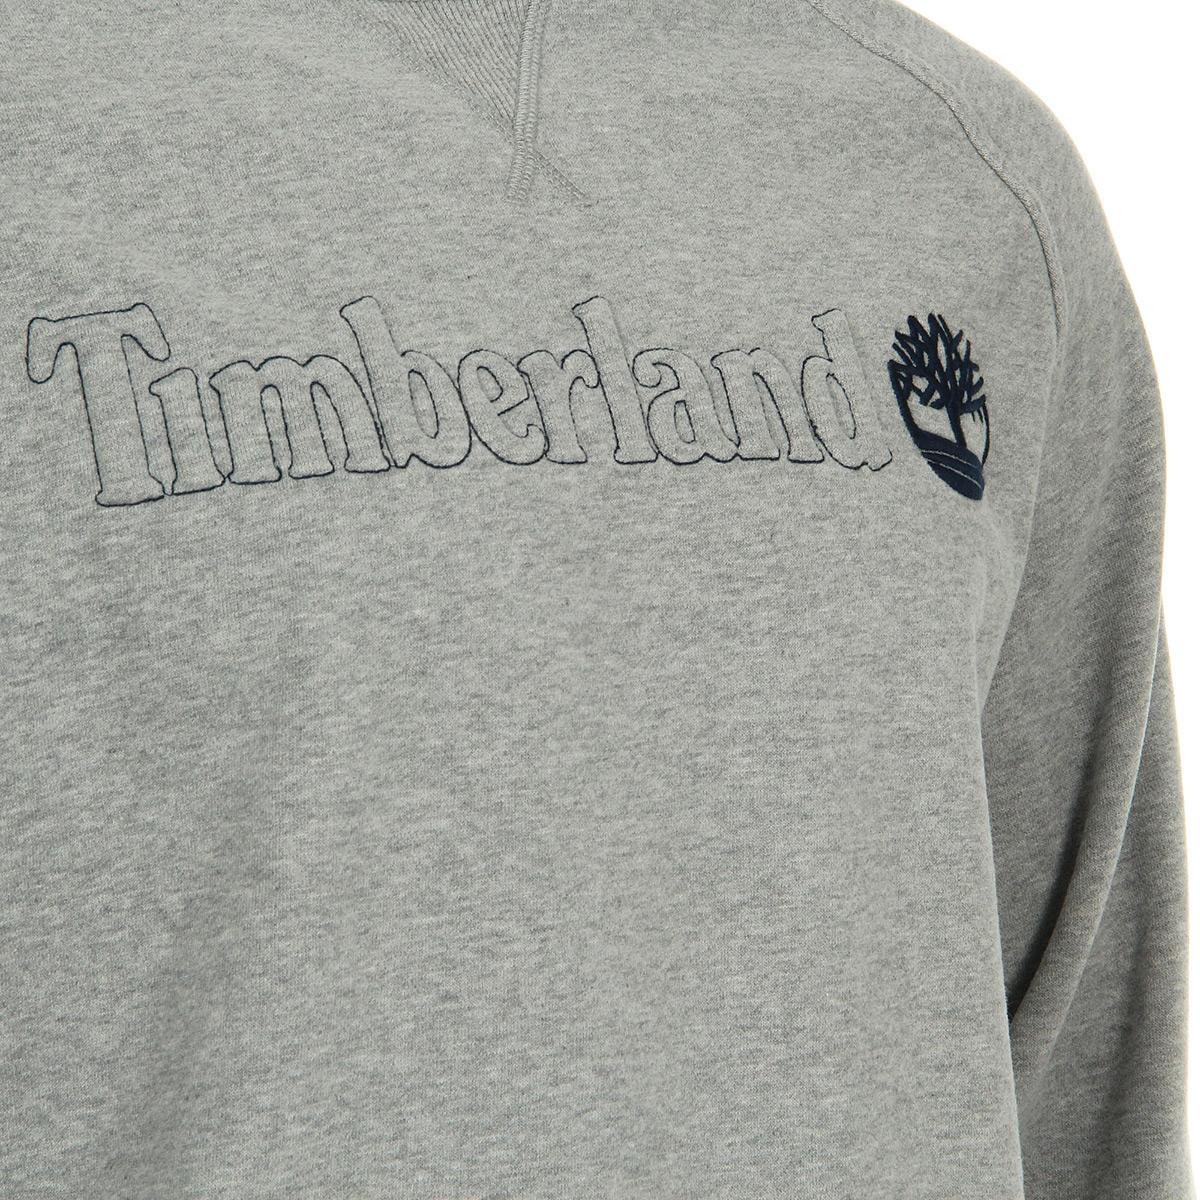 Timberland Wstfld Rvr Brand Log CA1LGR052, Sweats homme